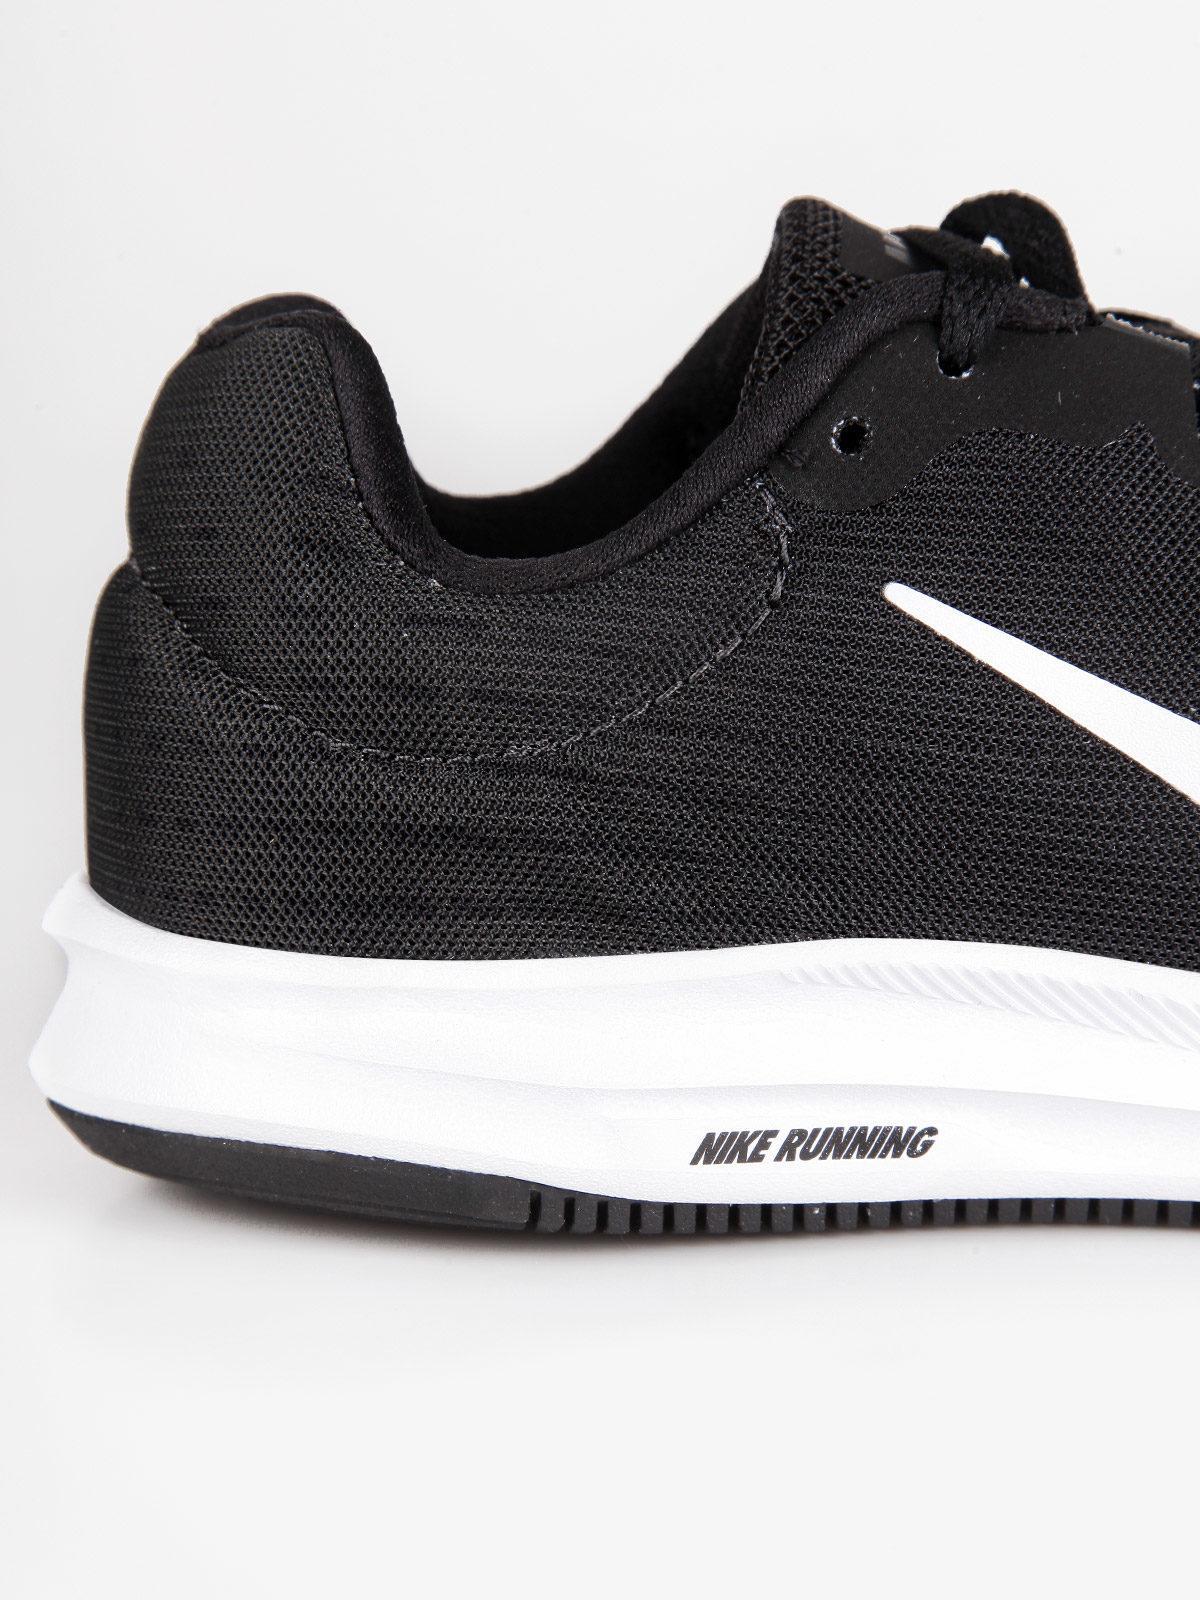 Sportive NikeMecshopping 8 Donna Scarpe Downshifter rWxeBodC